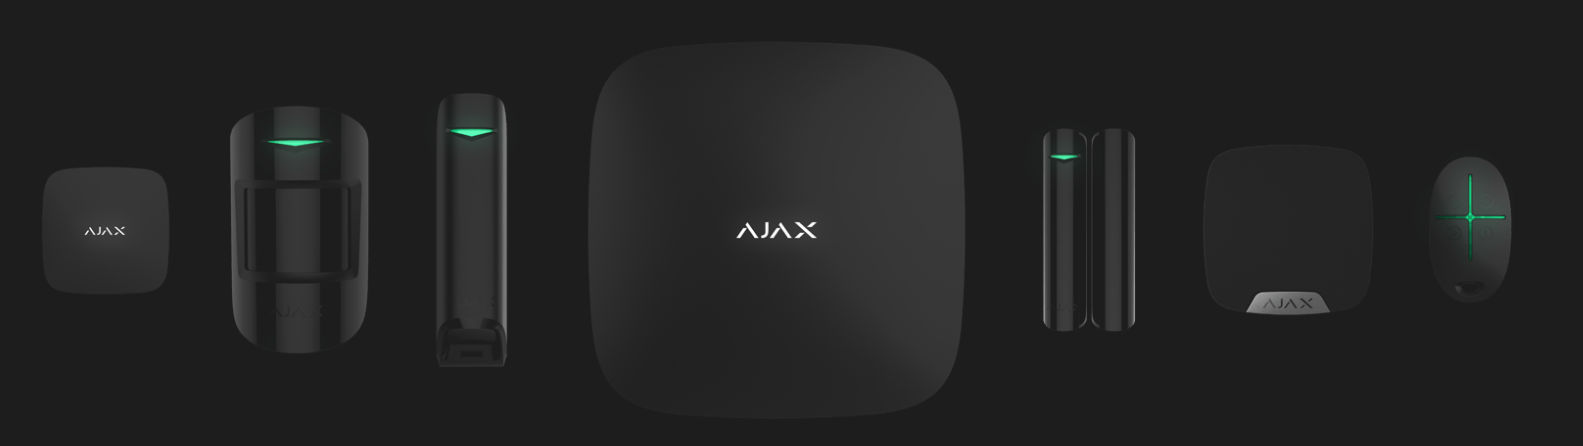 Revendeur Officiel Ajax Security Systems